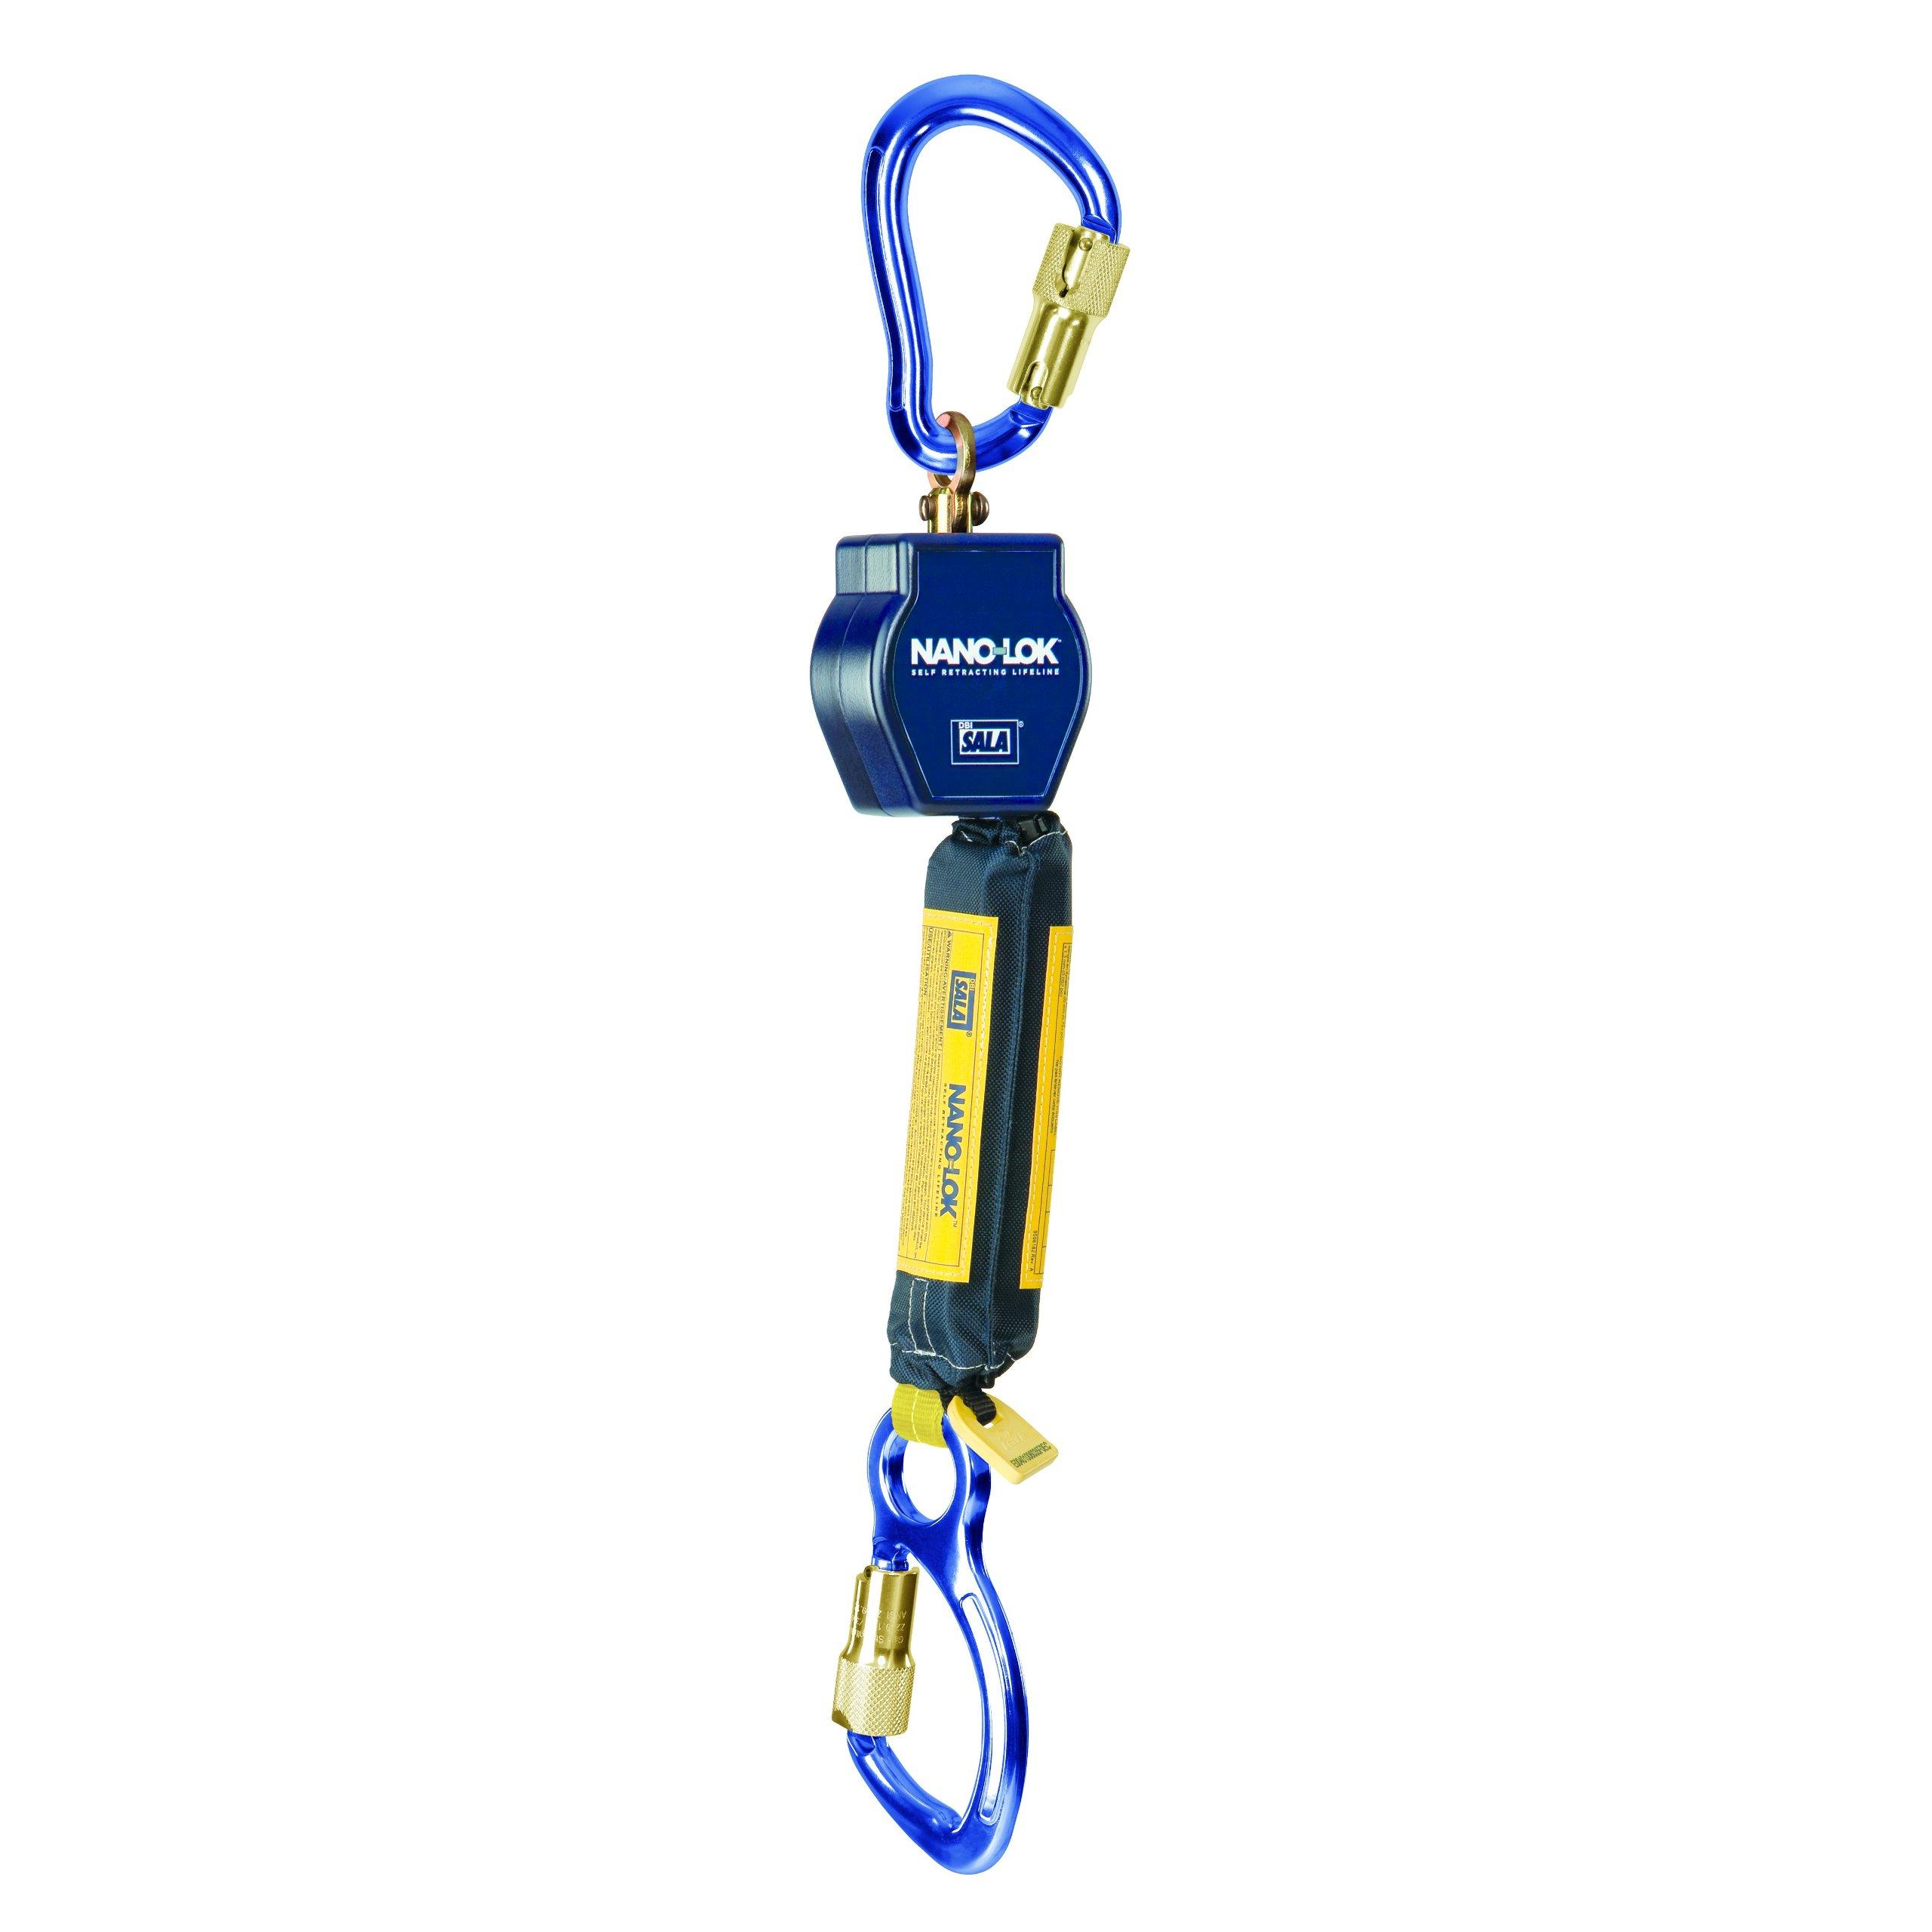 3M DBI-SALA Nano-Lok 3101235 Self Retracting Lifeline, 6', 3/4'' Dynema Polyester Web, Aluminum Carabiner, Swiveling Anchor Loop with Aluminum Carabiner, Blue